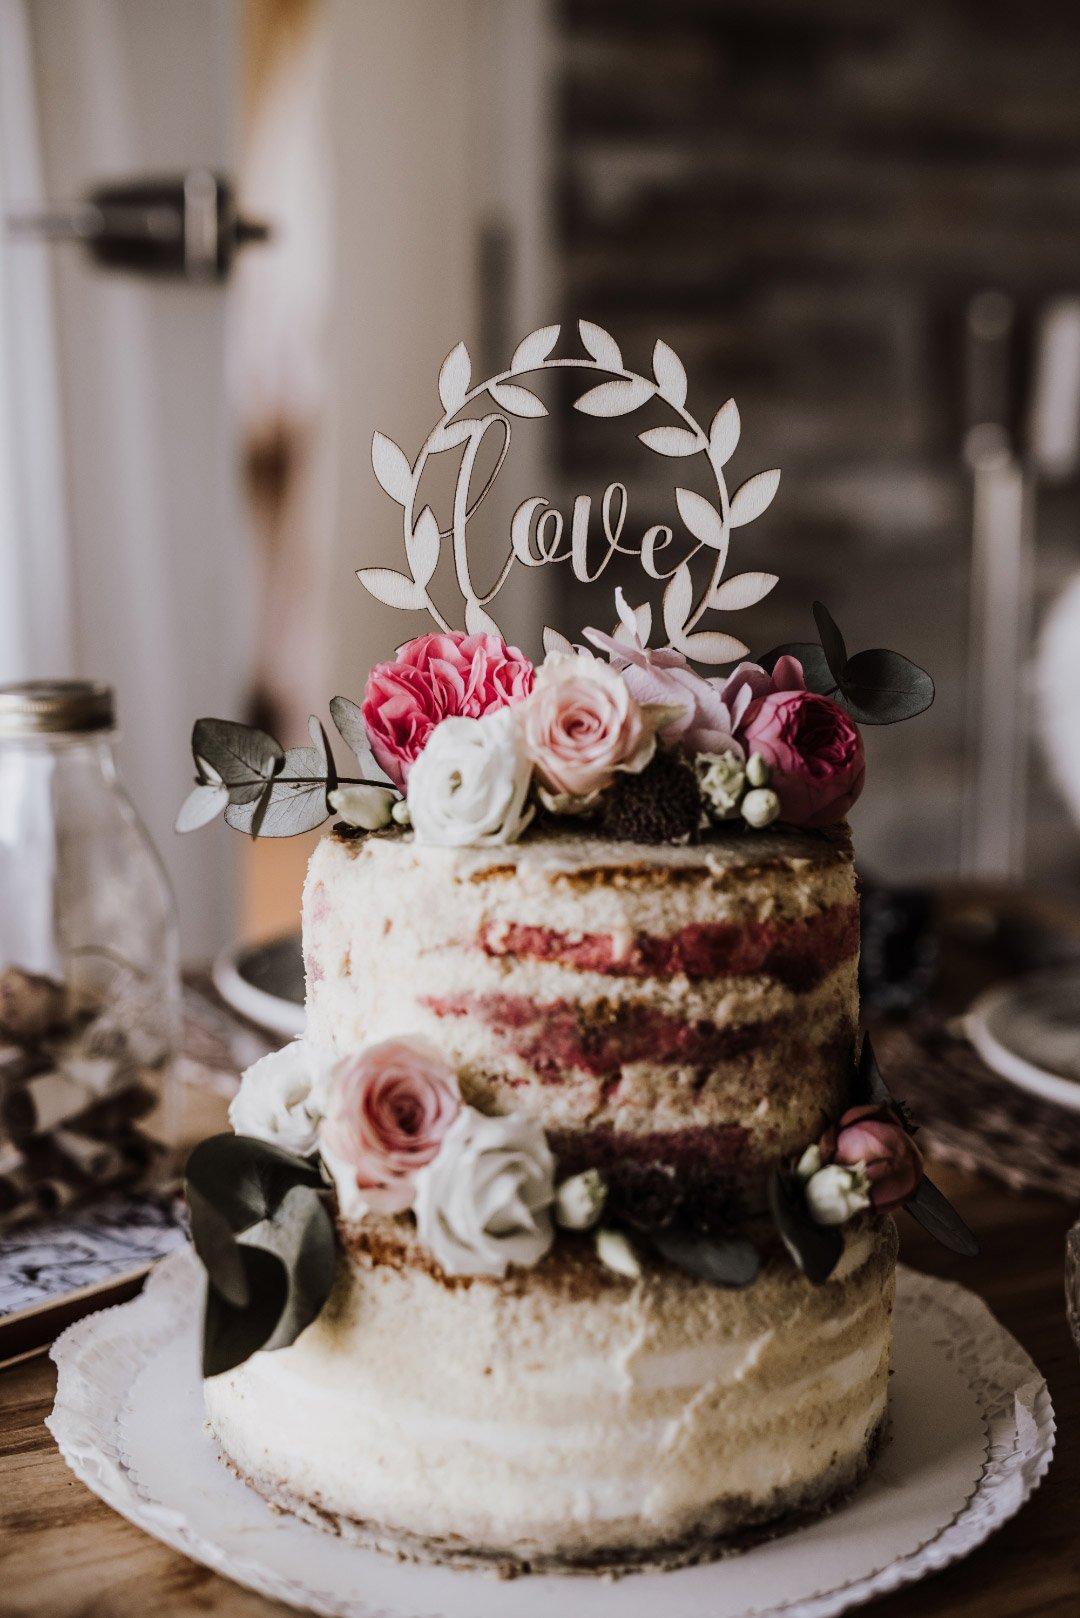 Naked Cake mit Love Caketopper aus Holz